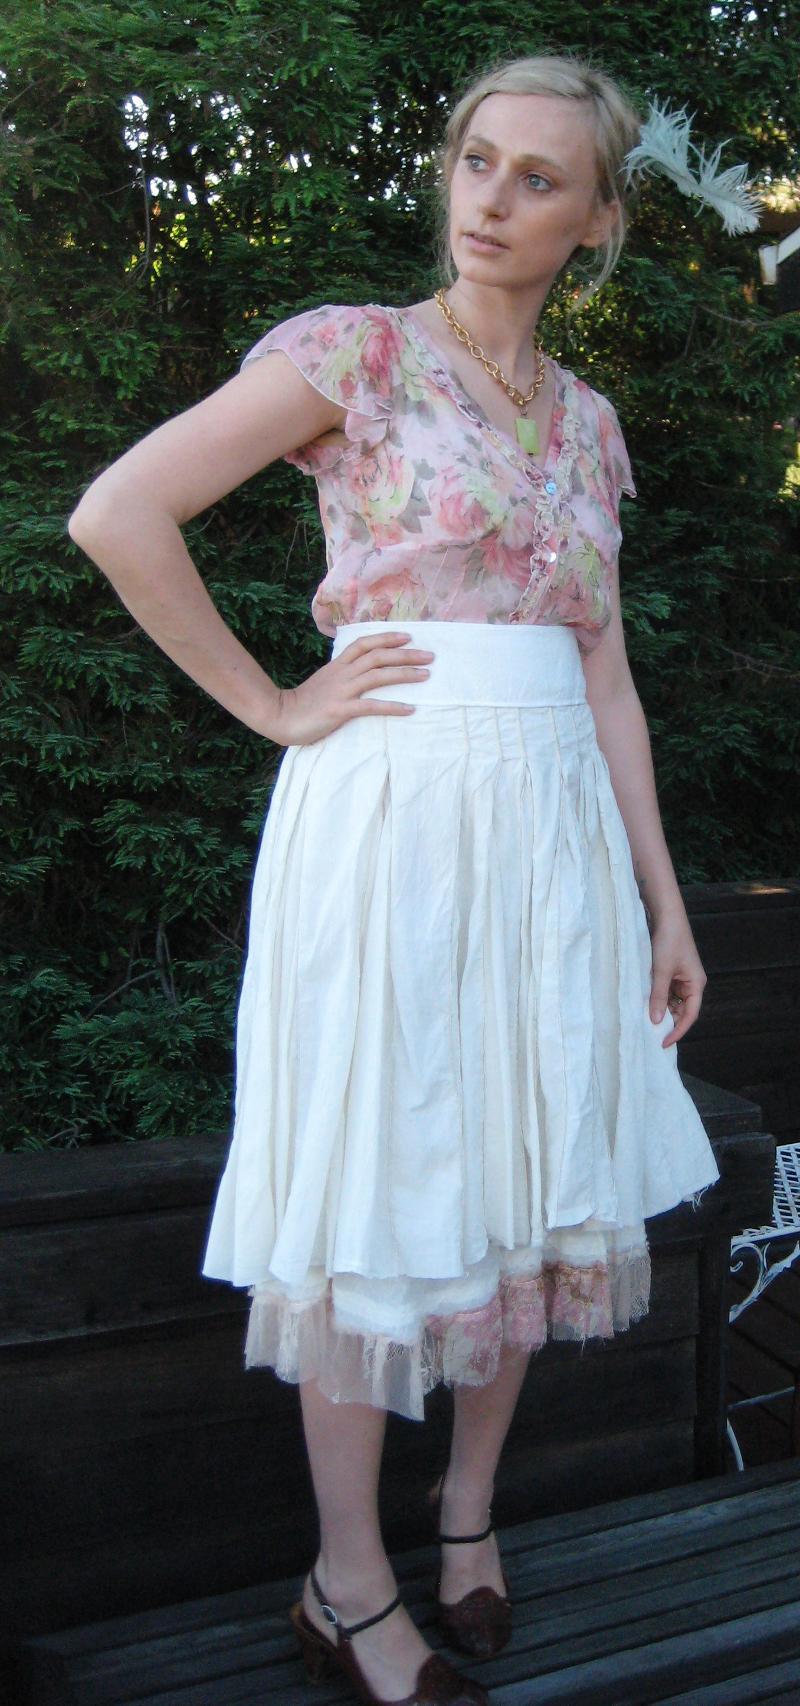 For Love & Liberty Blouse Biya skirt